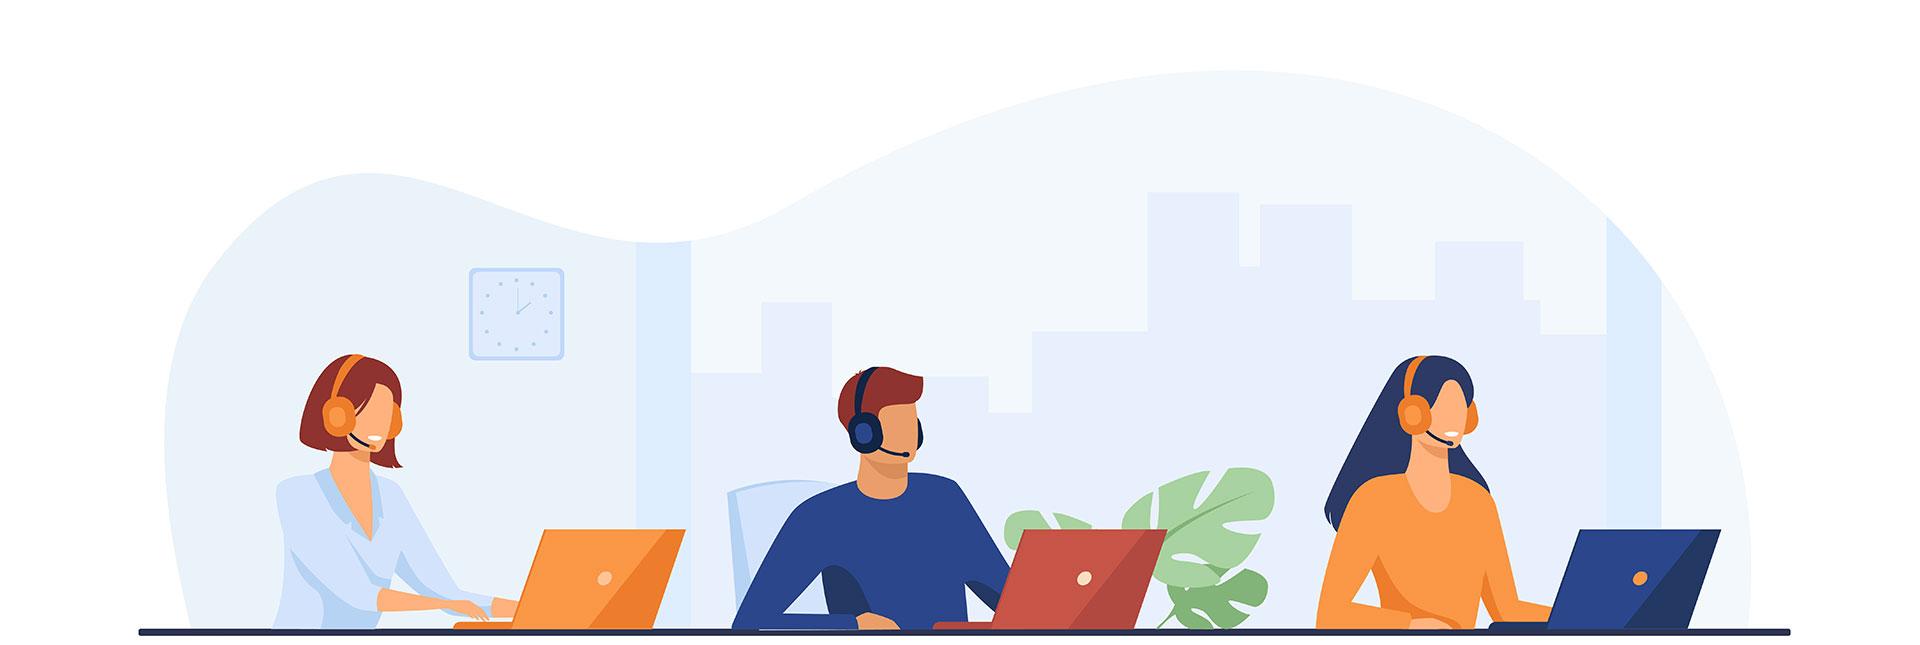 customer-service-illustration